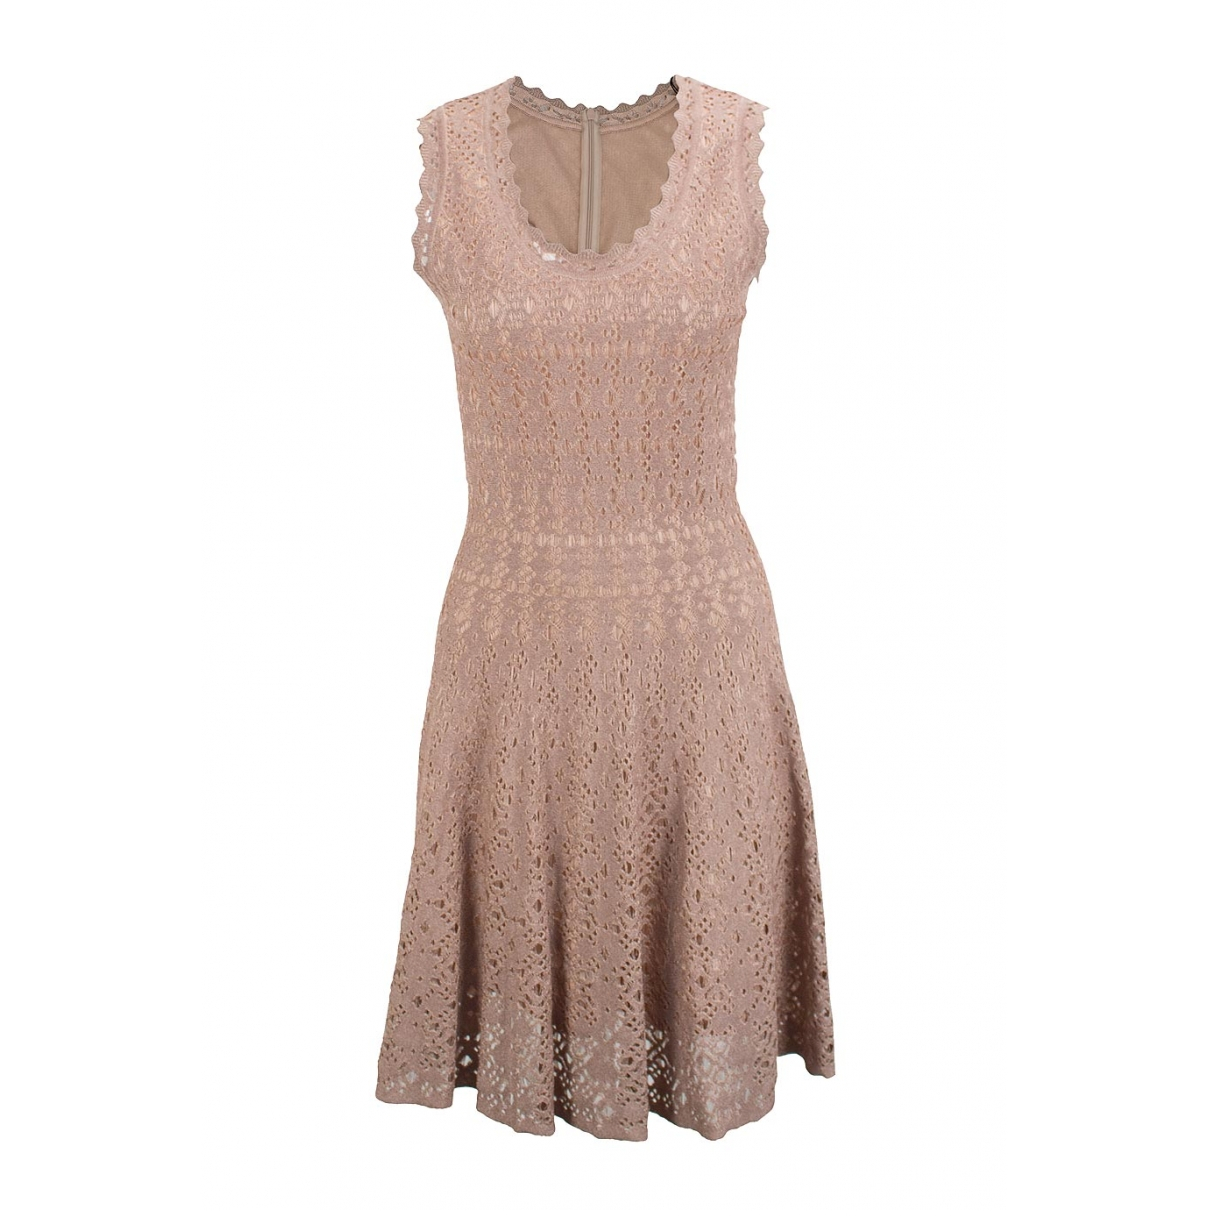 Alaïa \N Pink dress for Women 42 IT